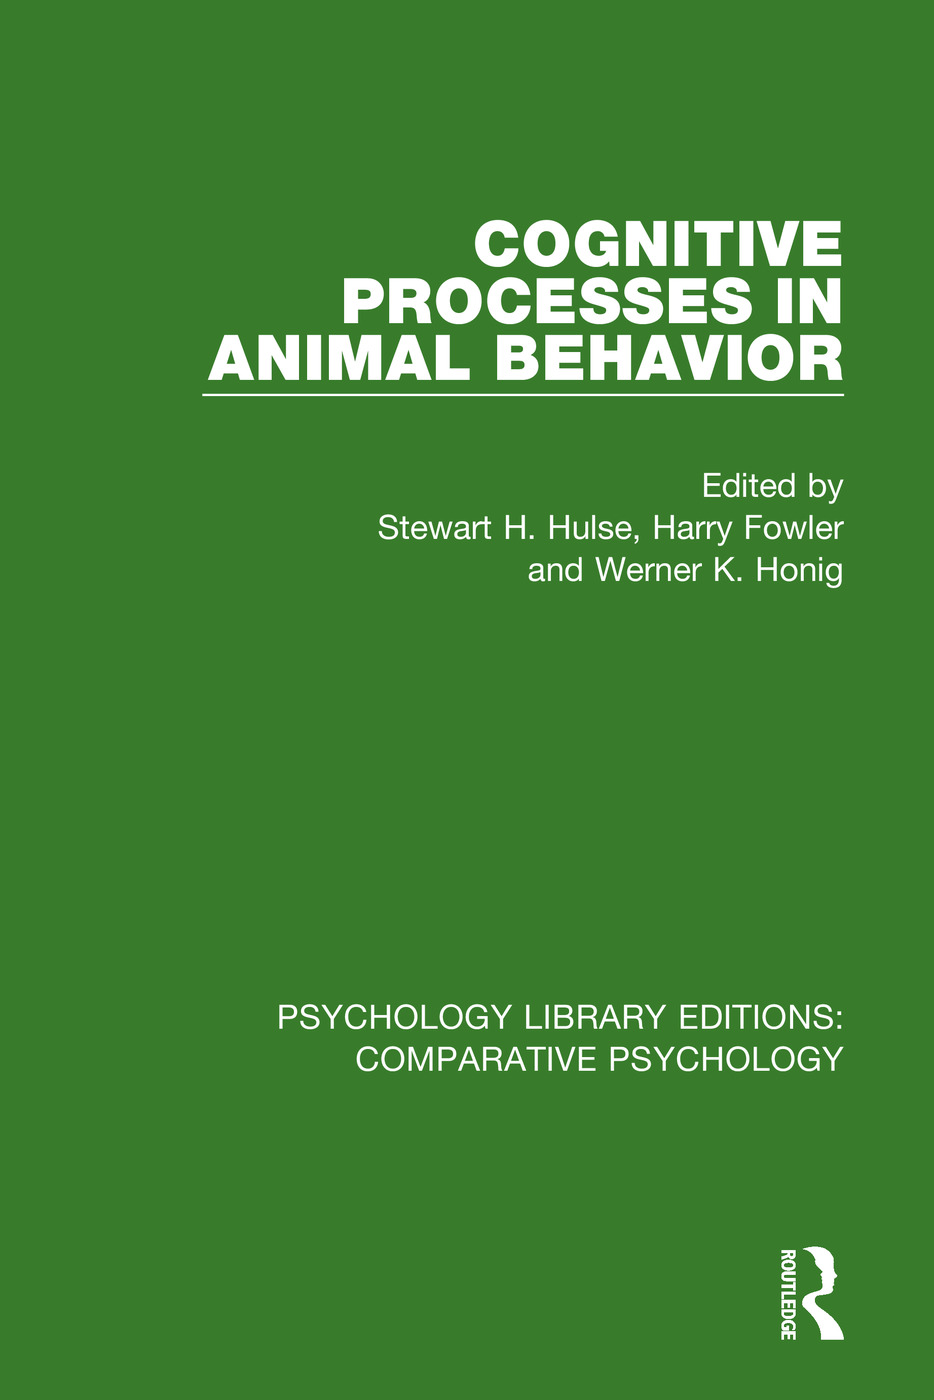 Cognitive Processes in Animal Behavior book cover